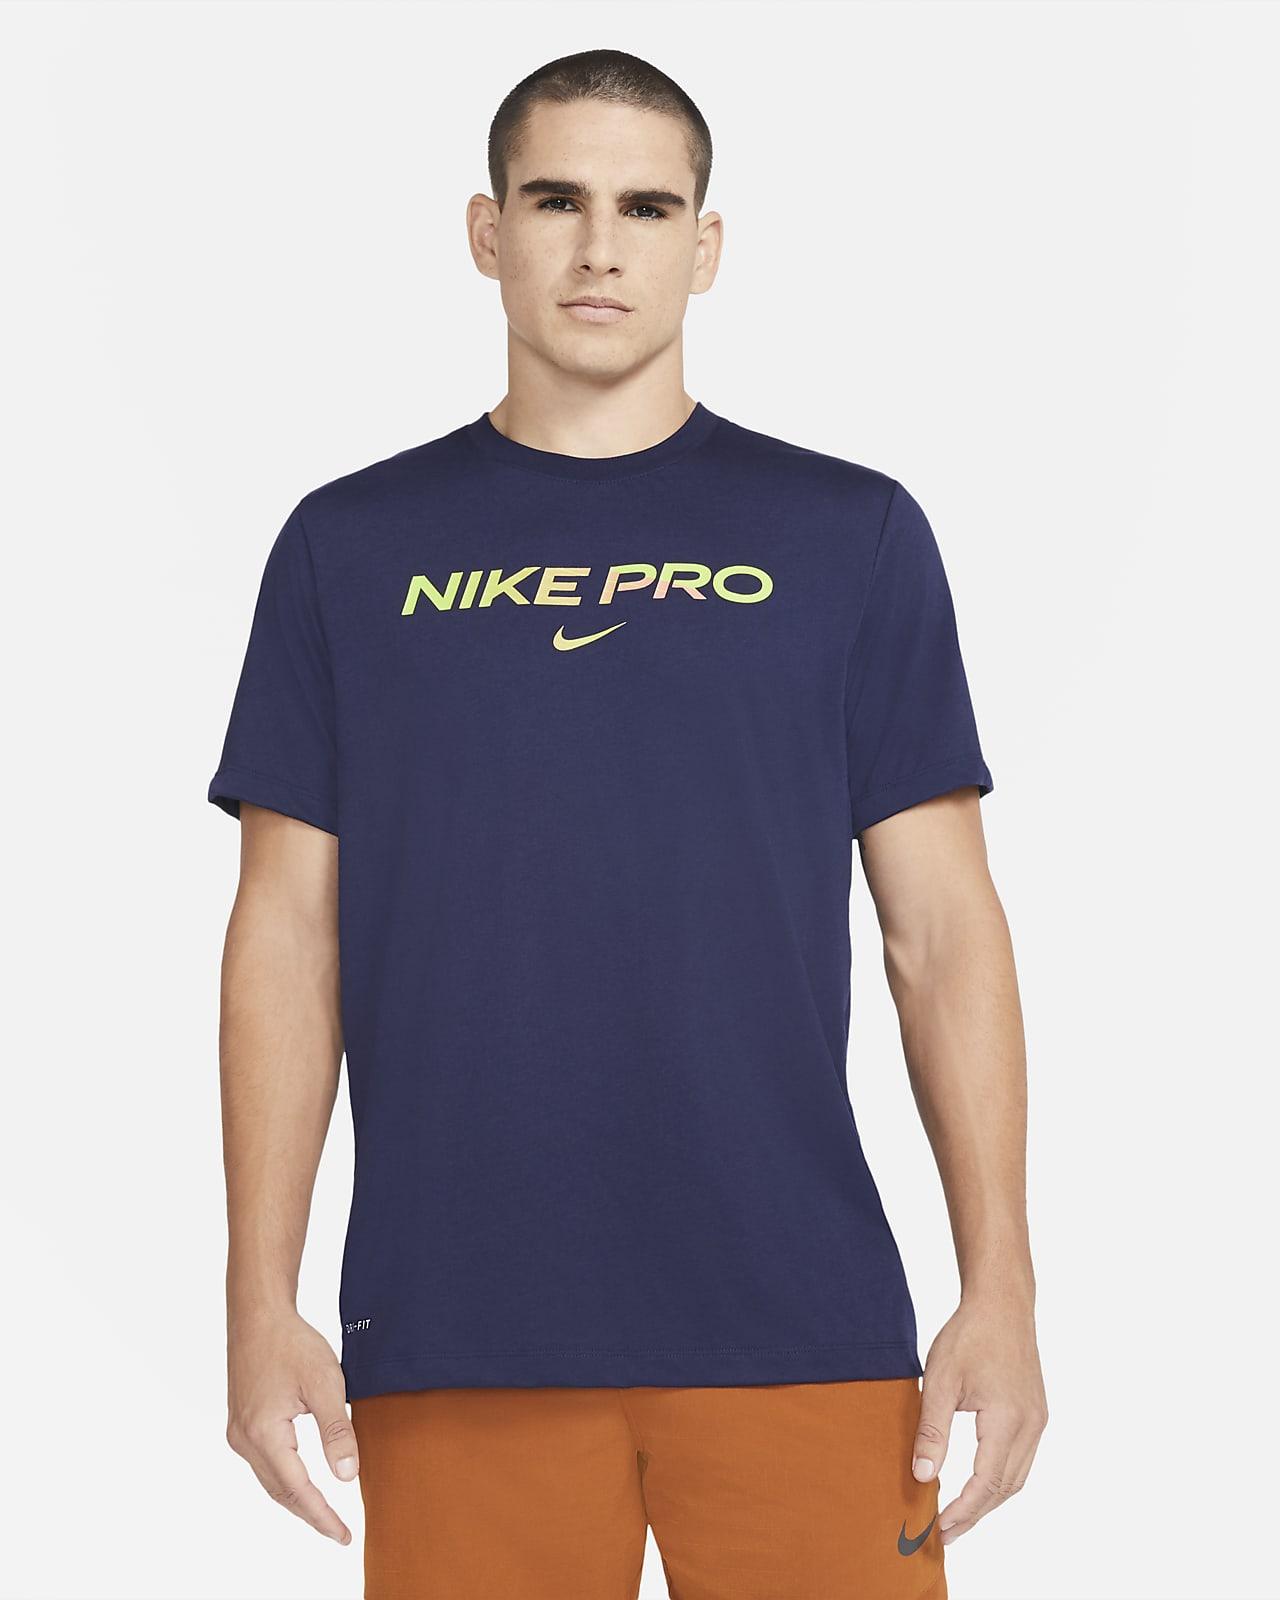 Playera para hombre Nike Pro